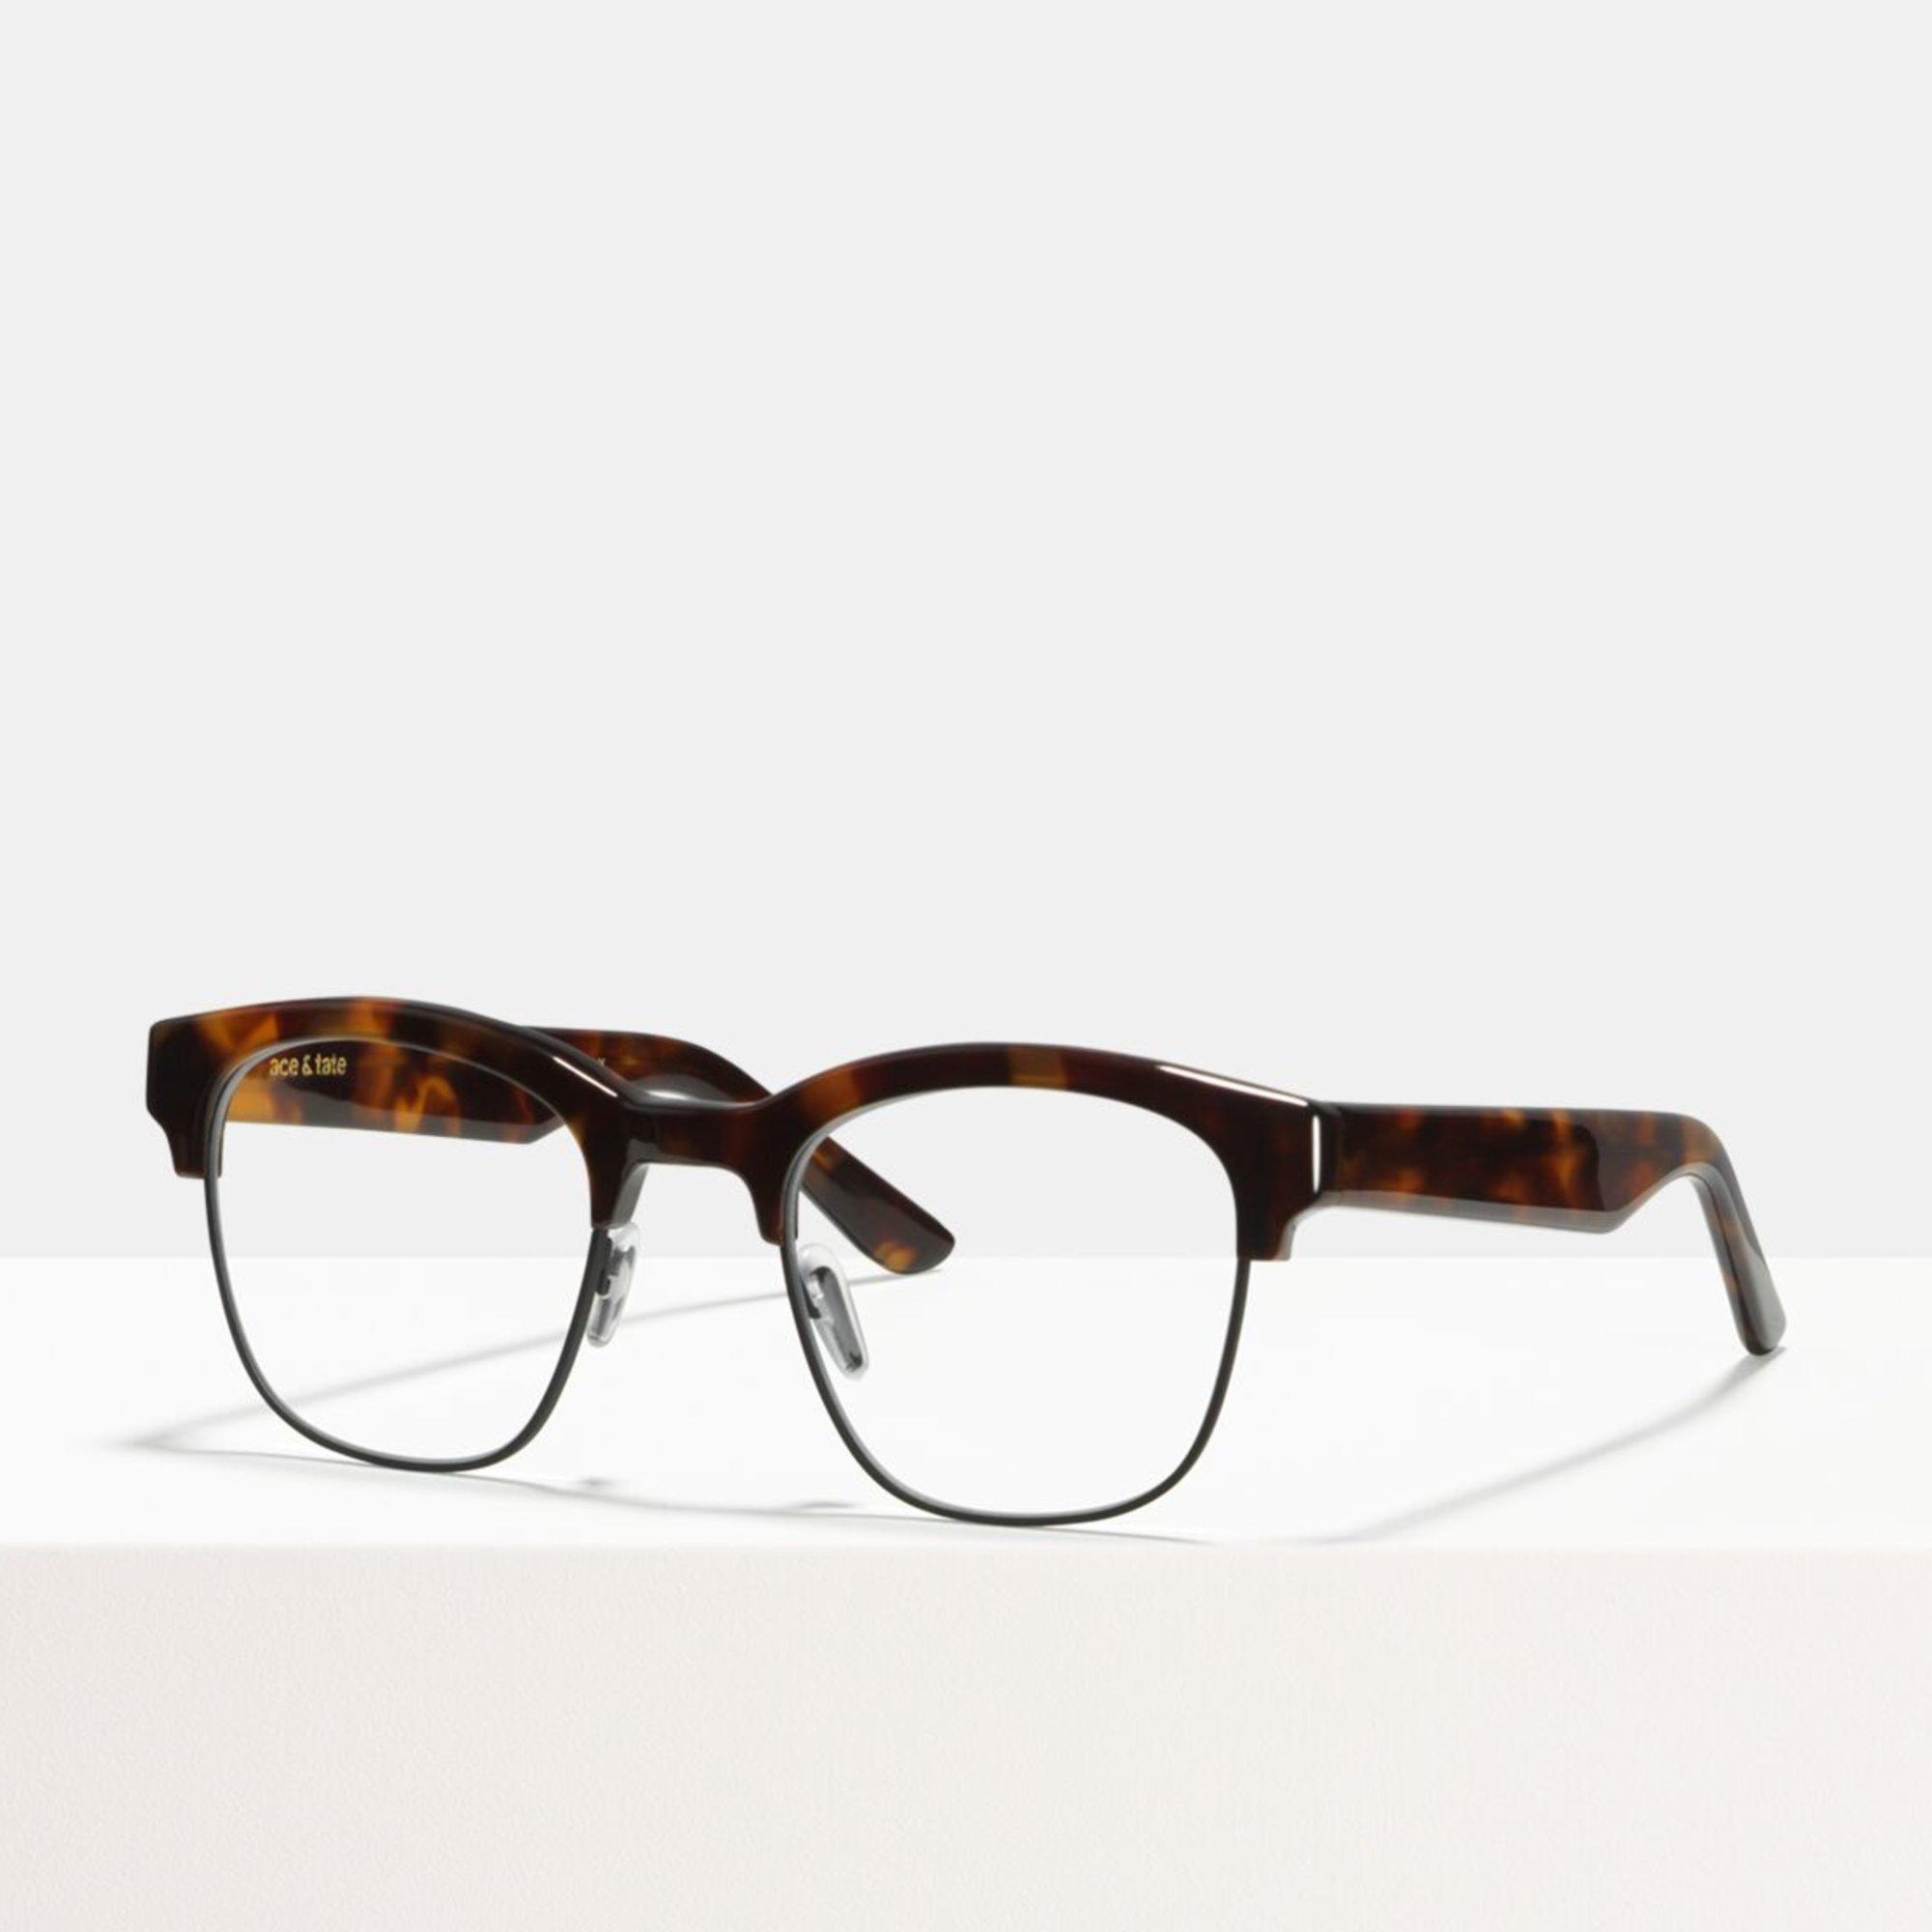 Ace & Tate Glasses | square metal in Brown, Orange, Yellow